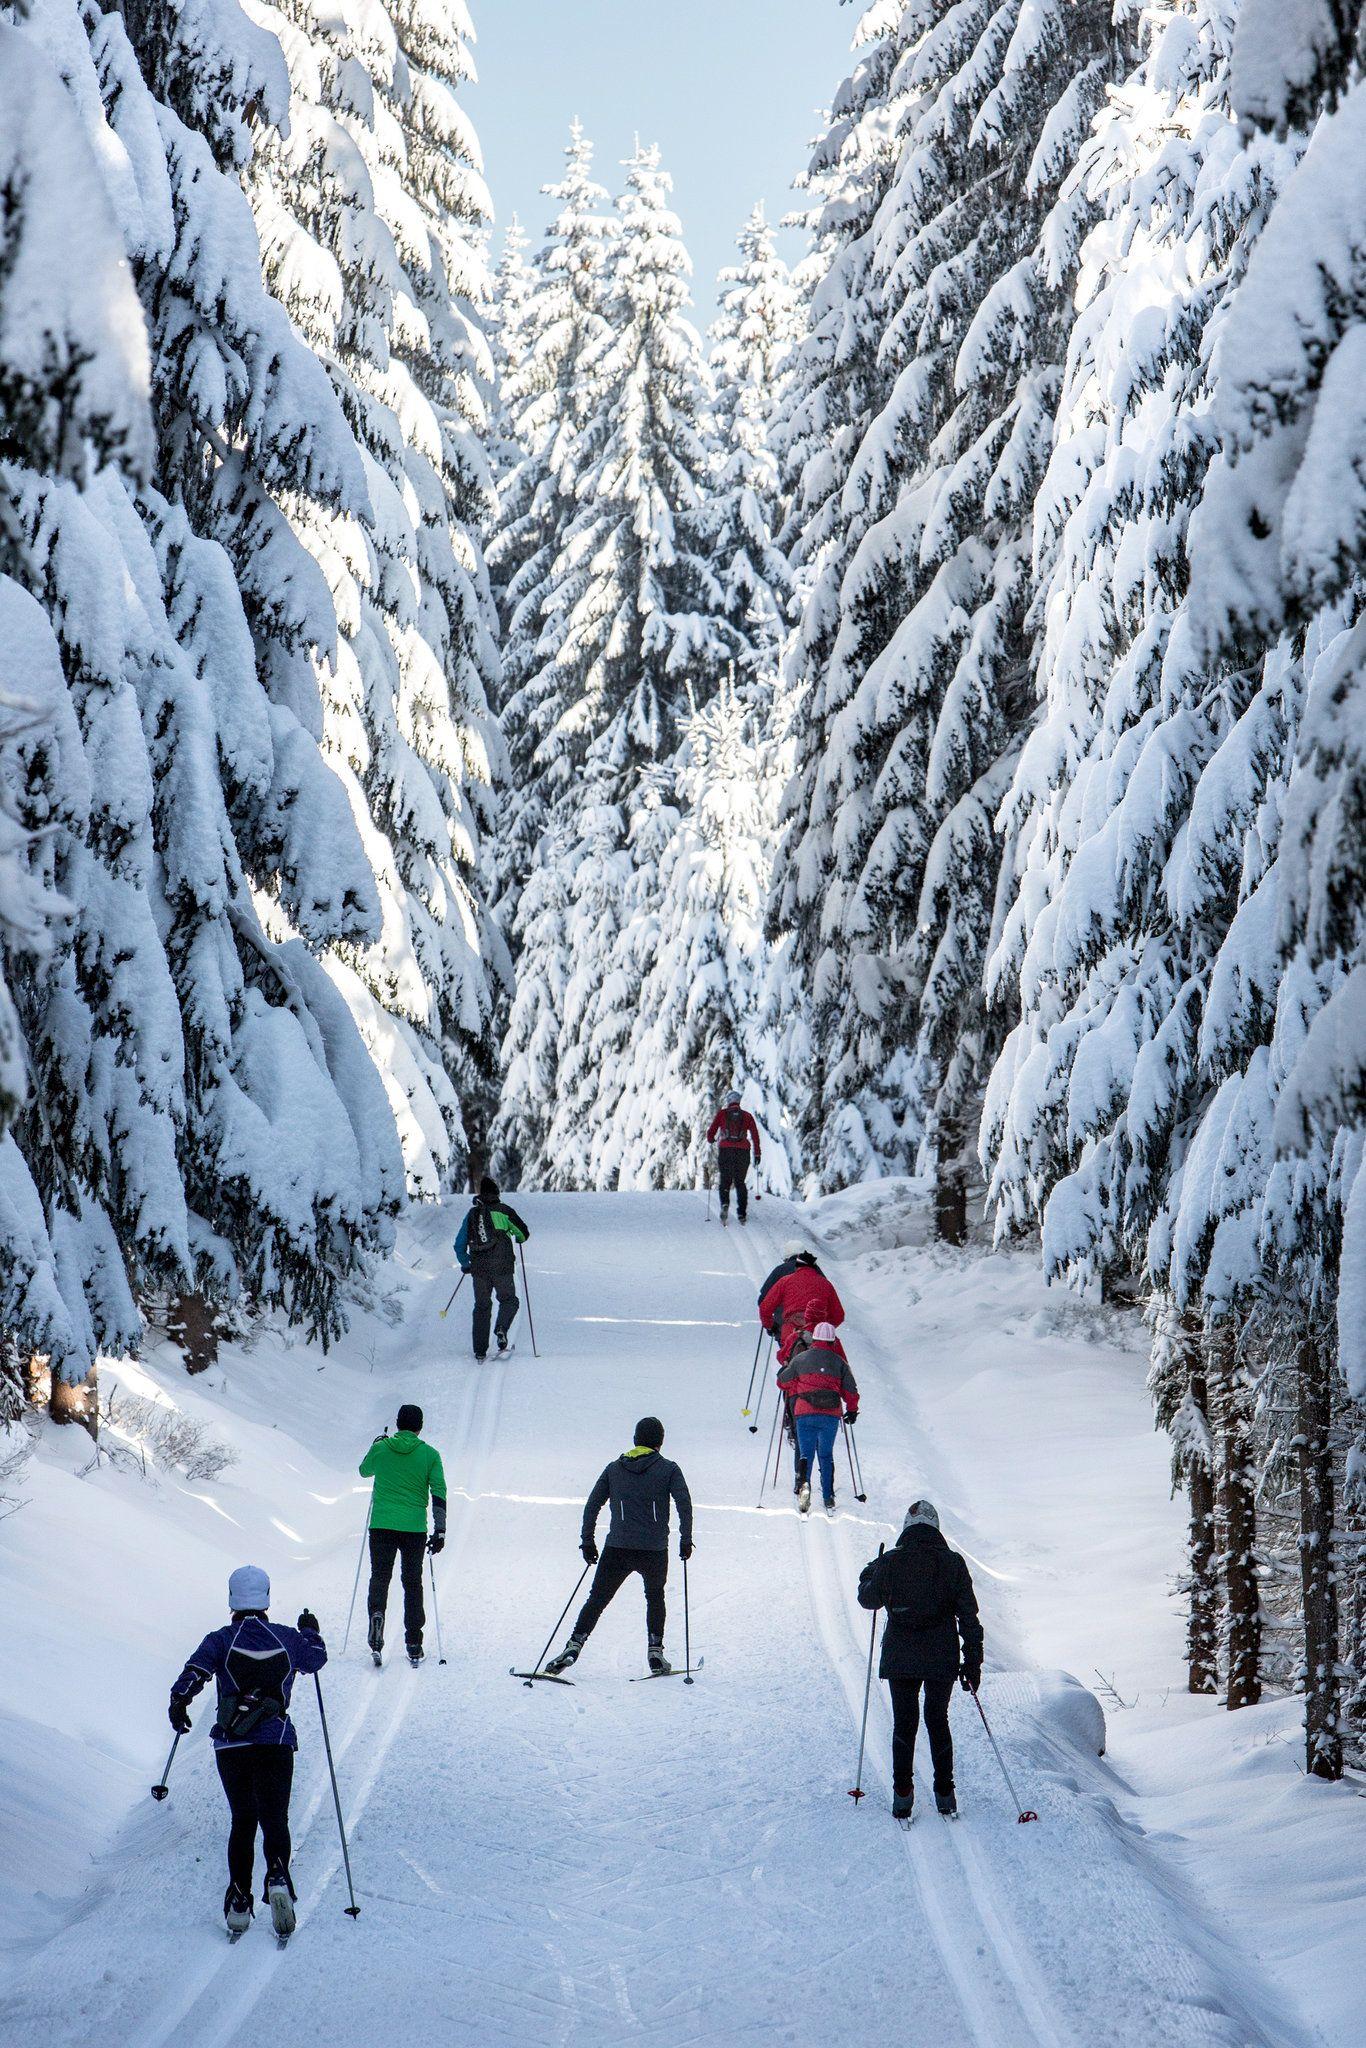 Bohemia S Secret Spot For Cross Country Skiing Cross Country Skiing Ski Europe Skiing Photography